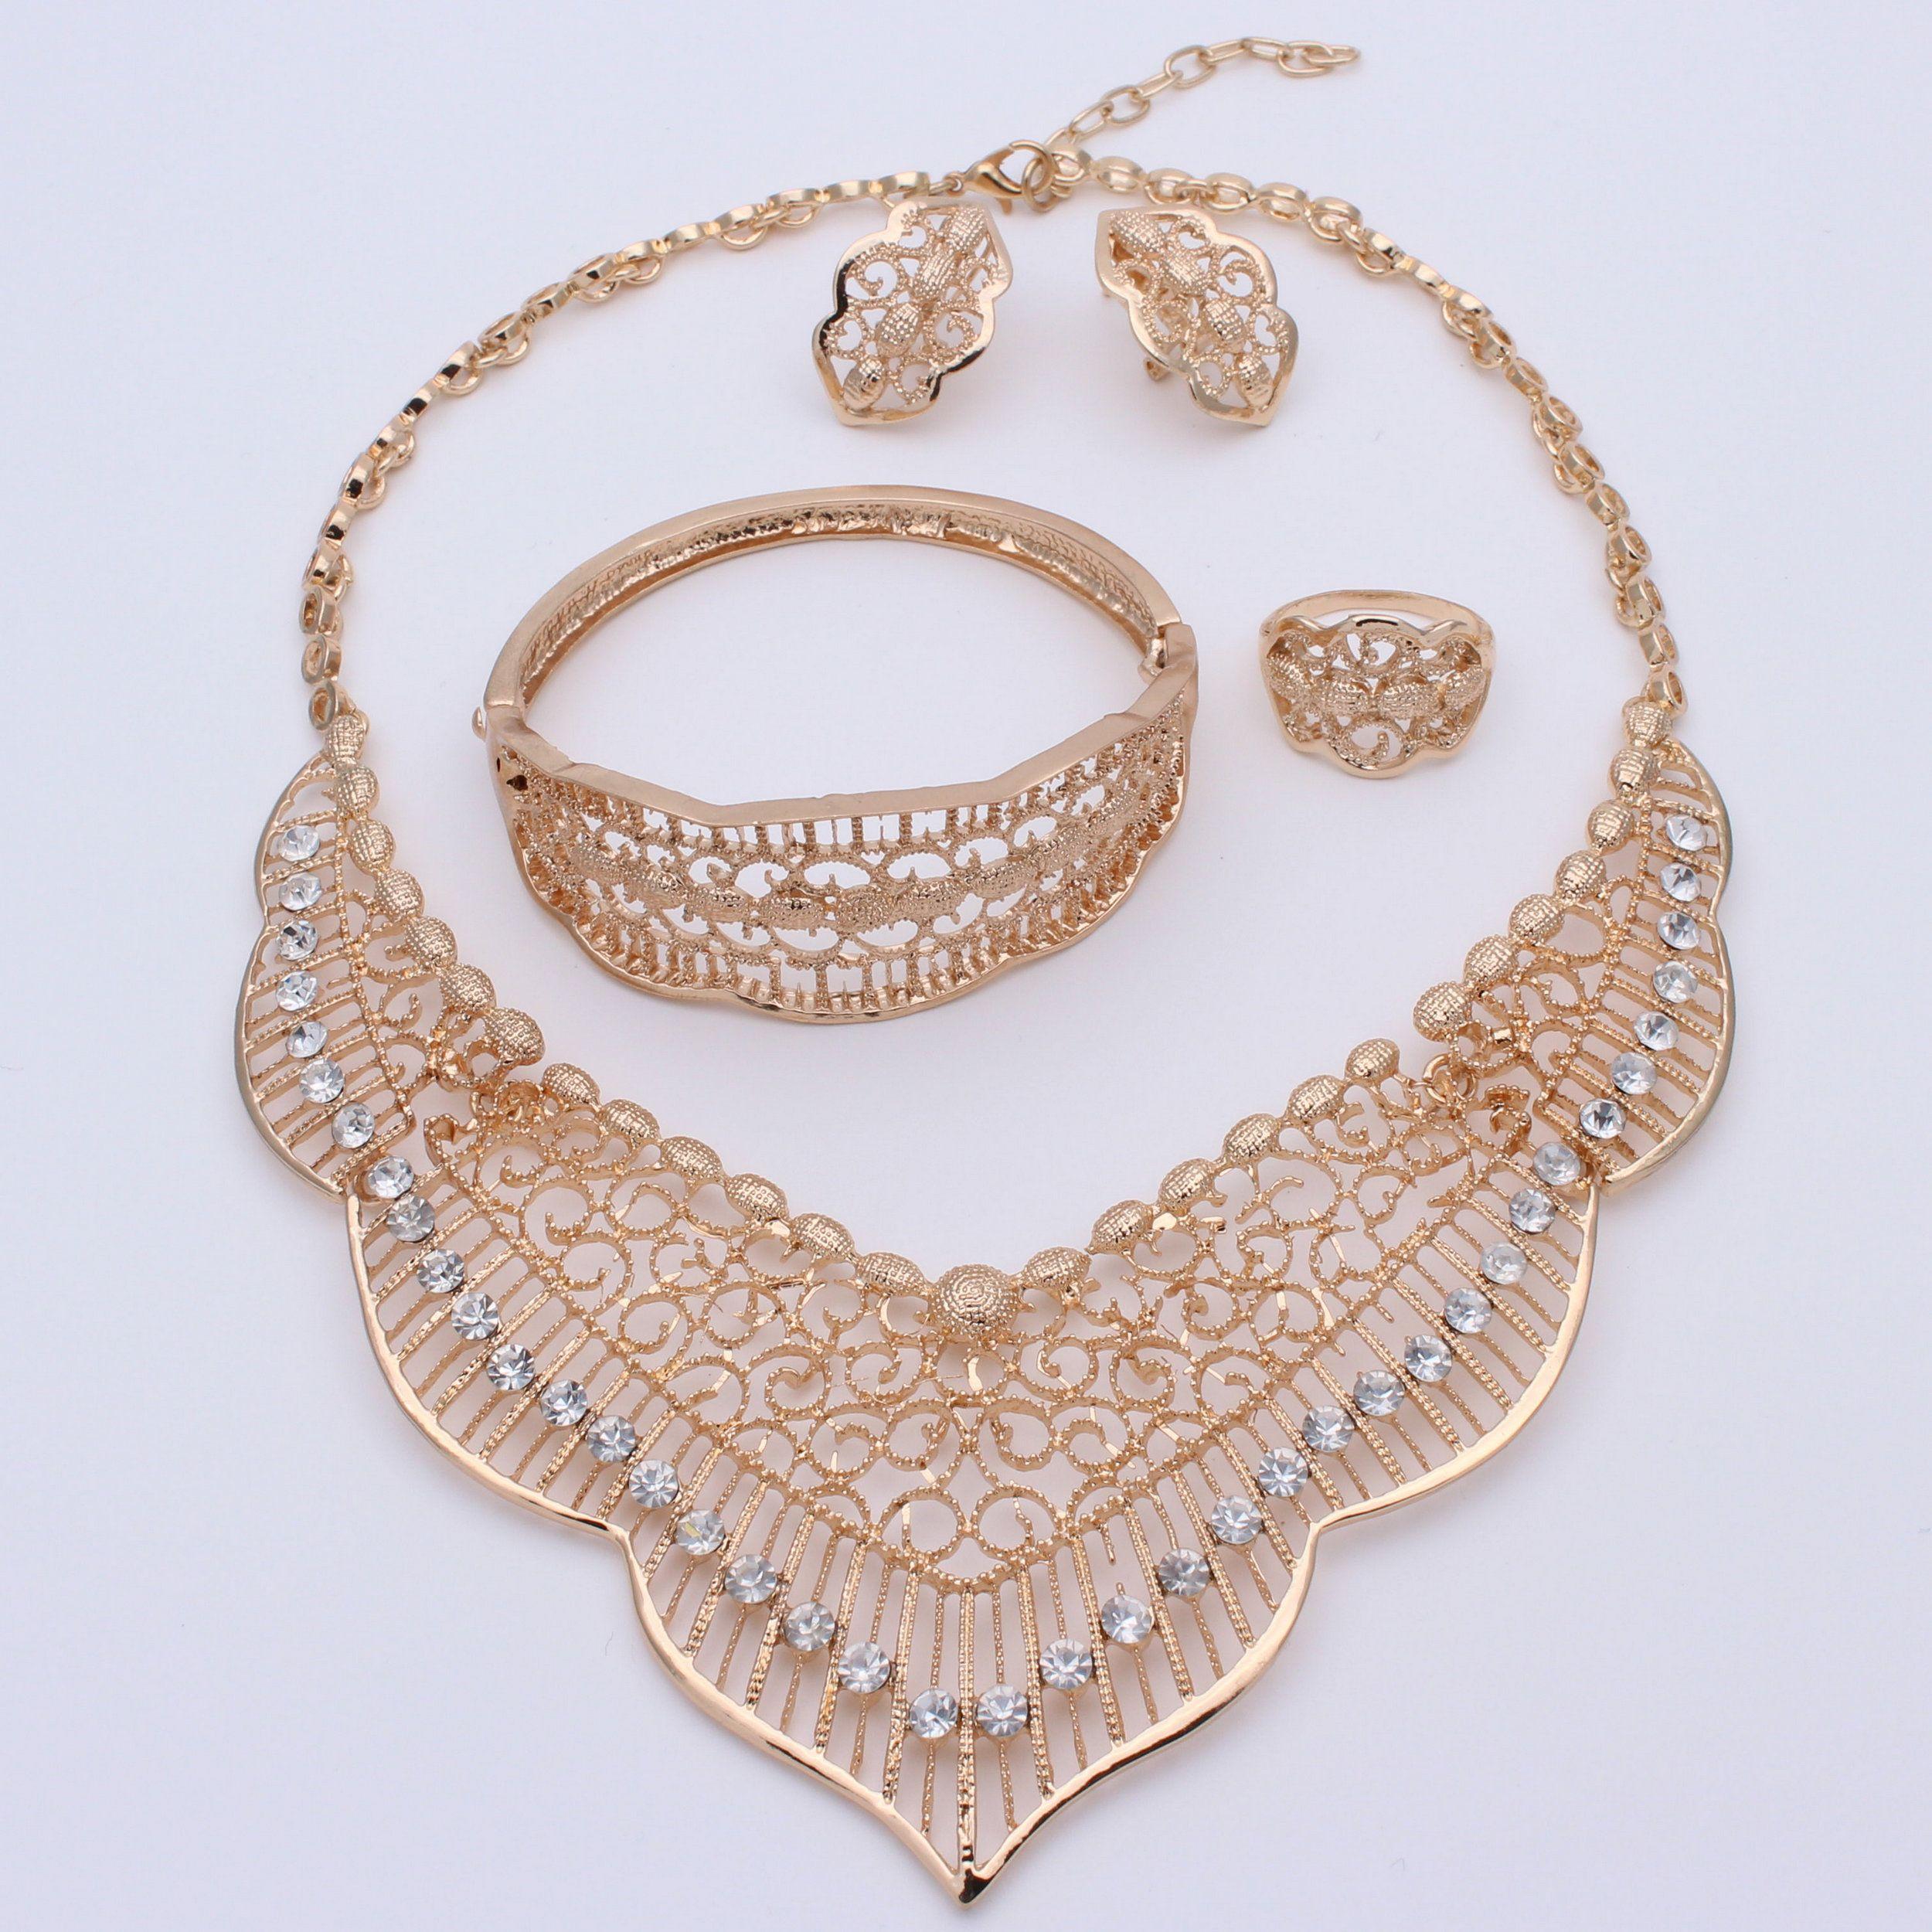 2018 New Fashion Bridal Jewelry Sets Dubai Gold Plated Costume Big